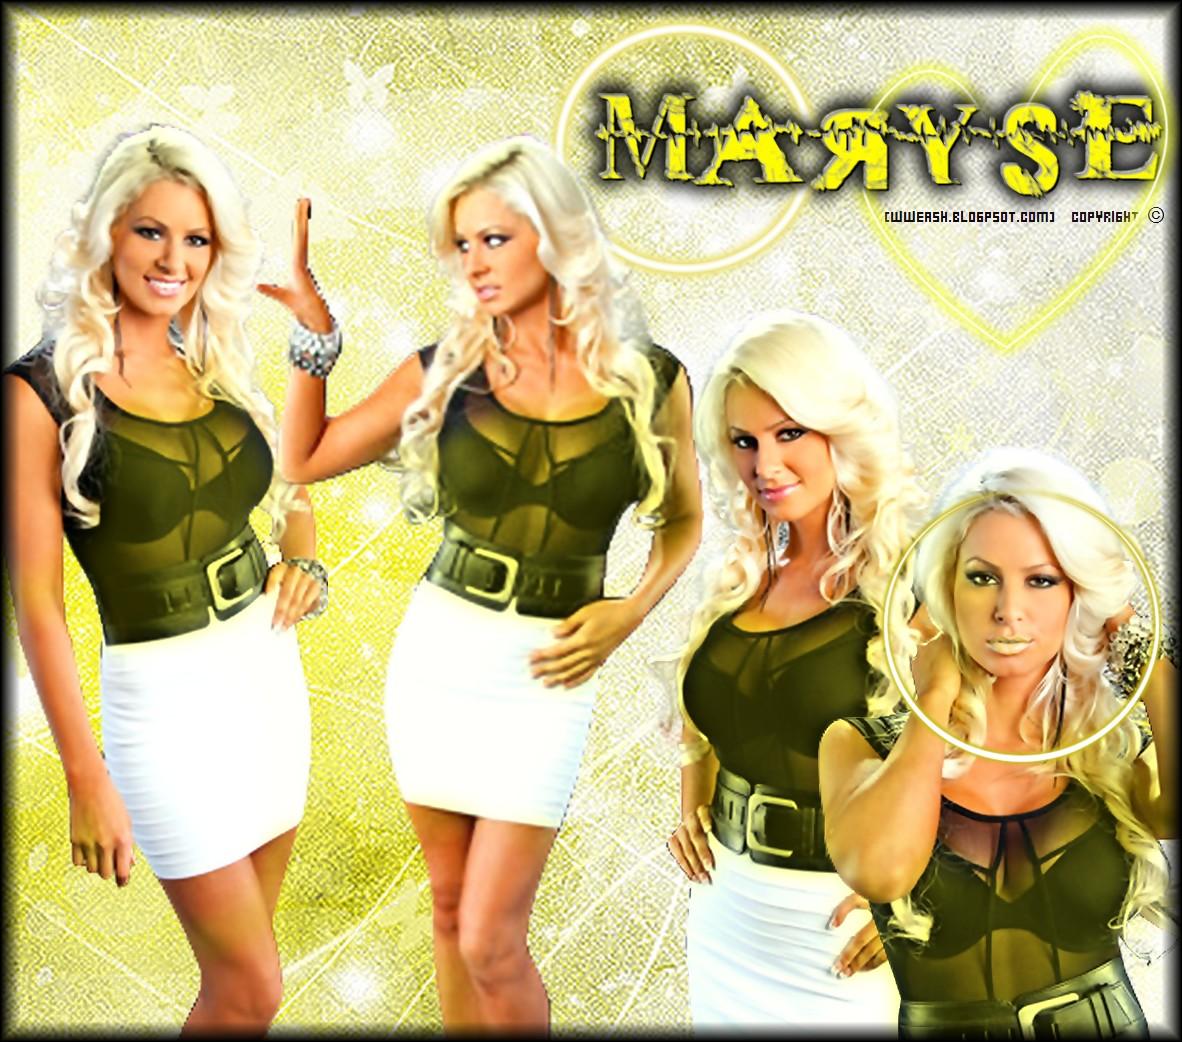 http://3.bp.blogspot.com/_s7eoA14qvTY/TG2AYPpr23I/AAAAAAAACII/zCQKIYkr7x4/s1600/Maryse_Blend_wweash.jpg